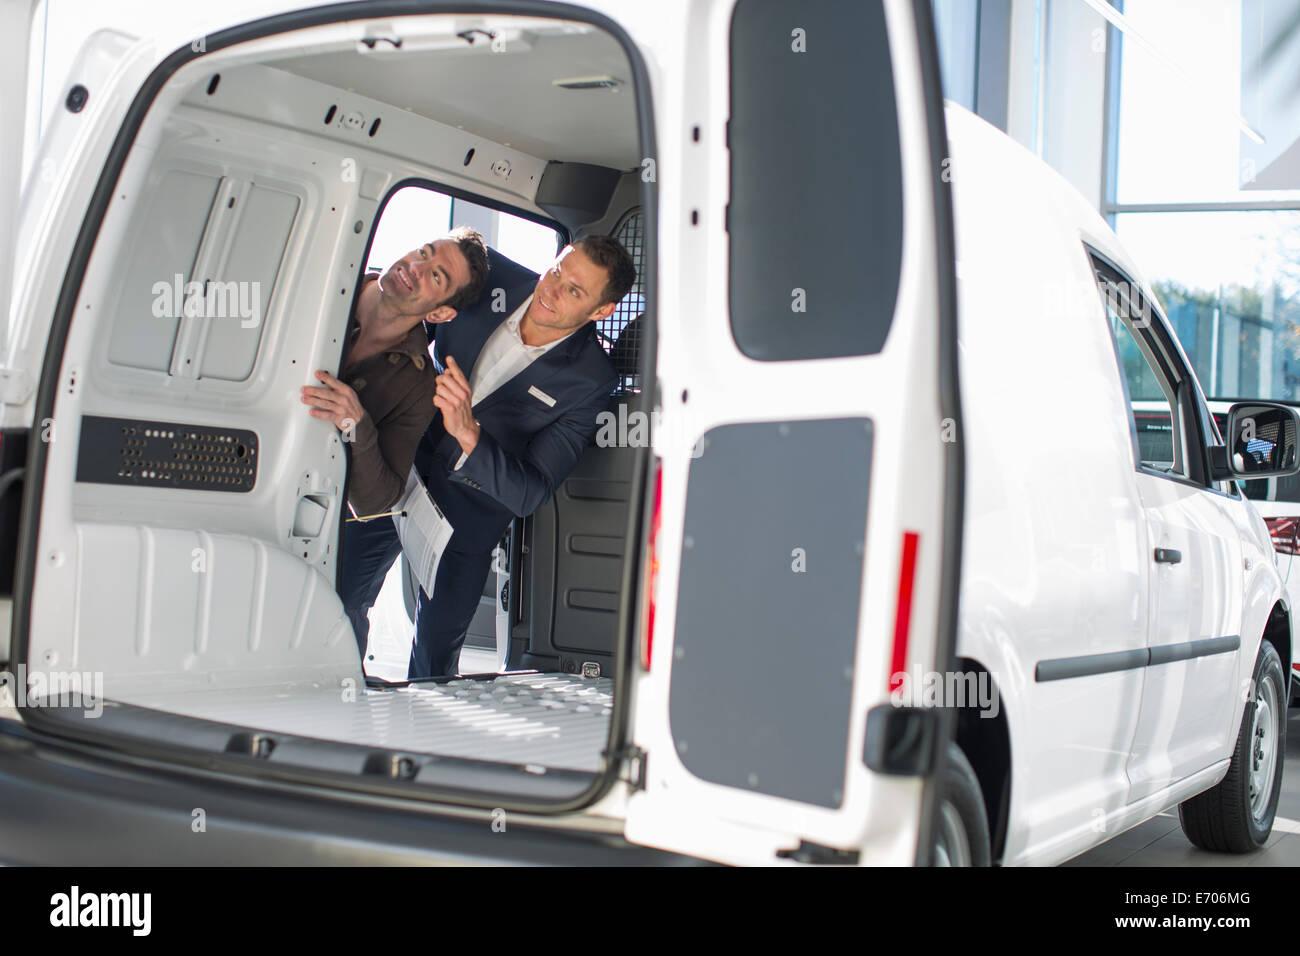 Customer and salesman checking vehicle interior in car dealership - Stock Image